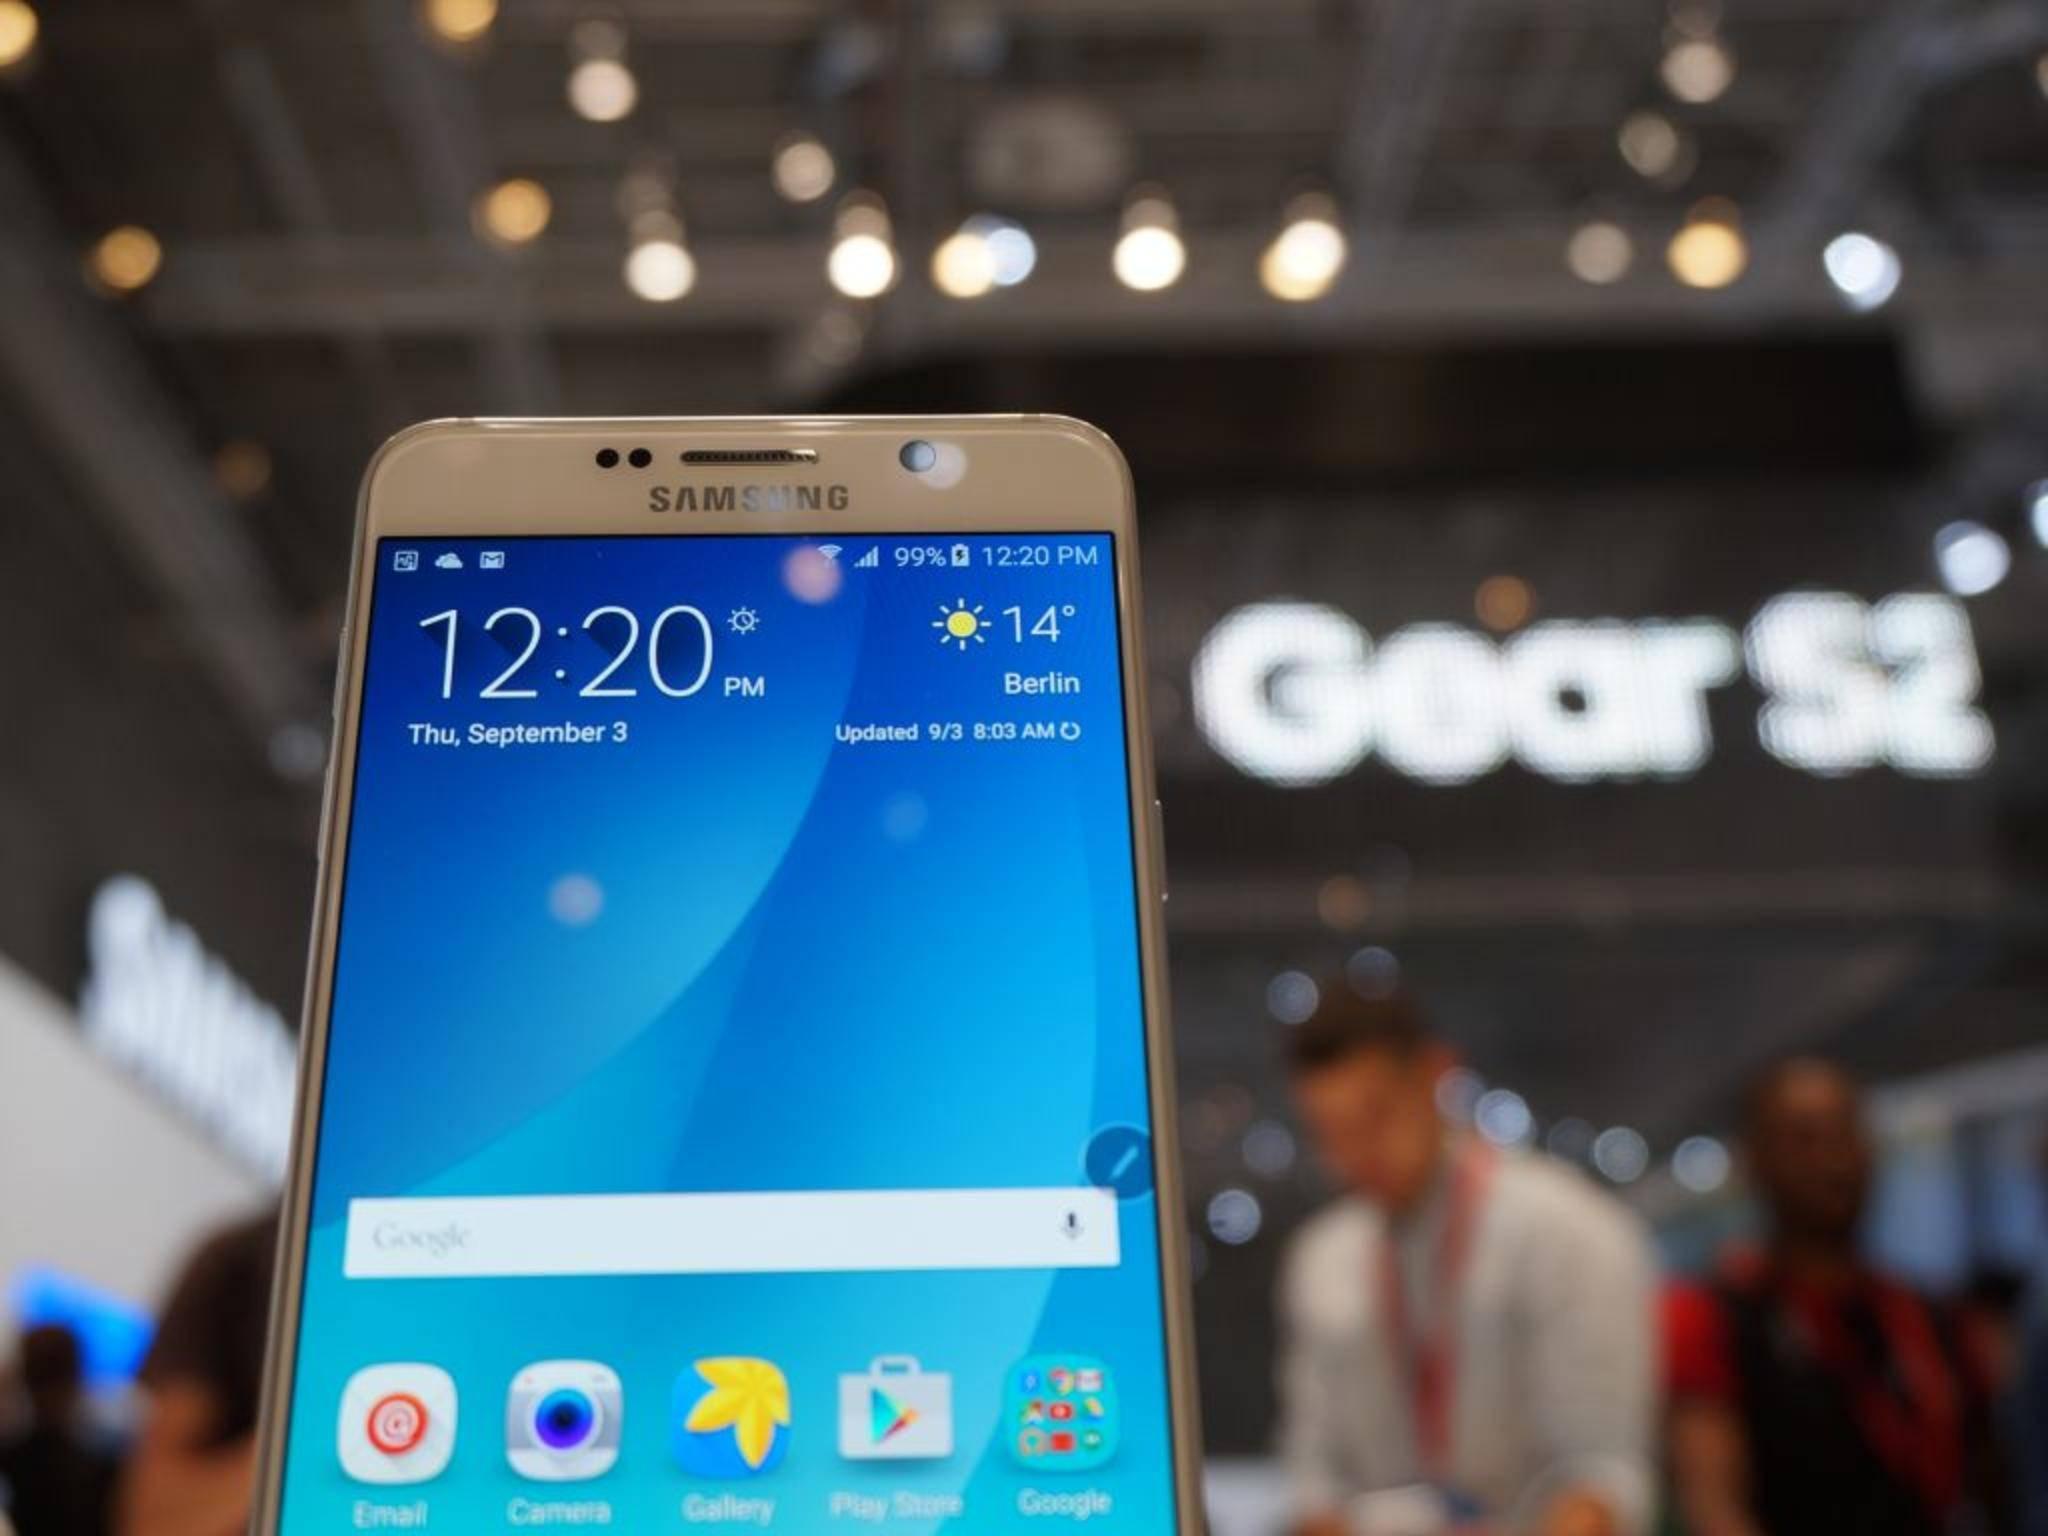 Samsung Galaxy Note 5 12